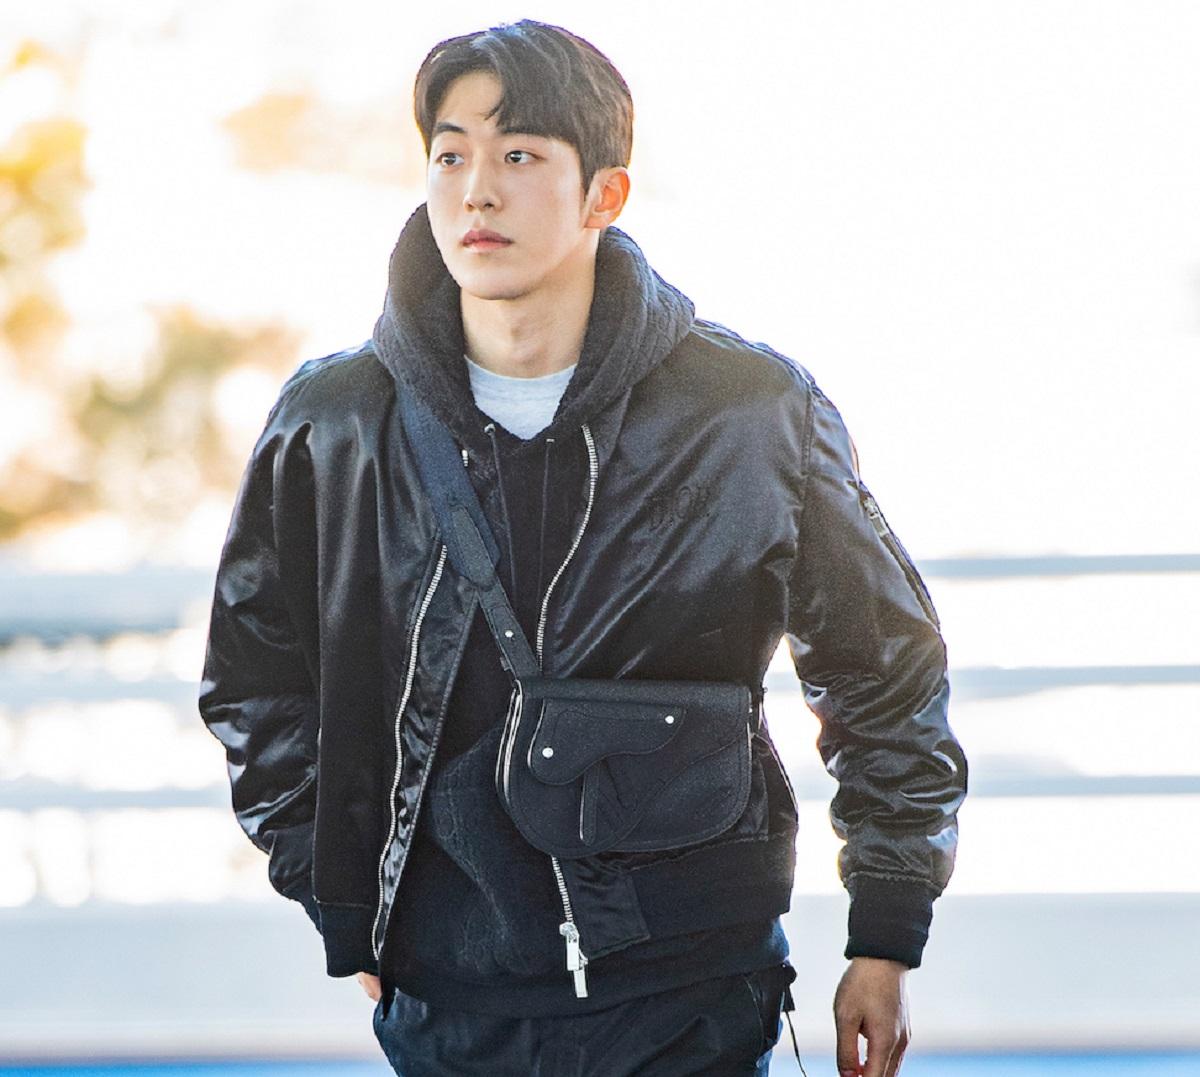 Gaya Traveling yang Stylish Aktor Nam Joo Hyuk